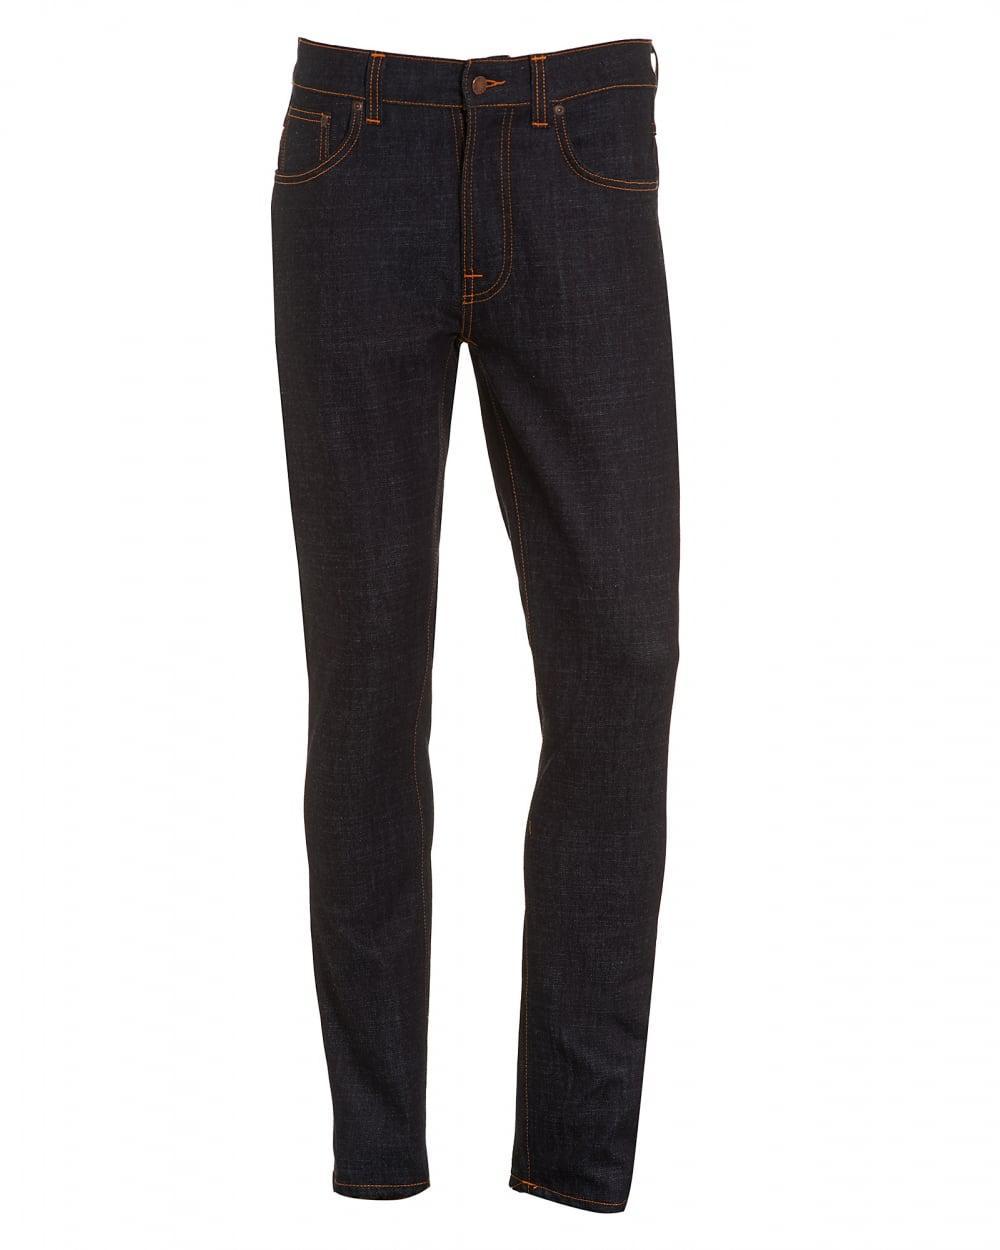 Maigre Maigre-jeans D'ajustement Extensible En Denim Organiques Dean Jean Nudie LG9yefuyK3